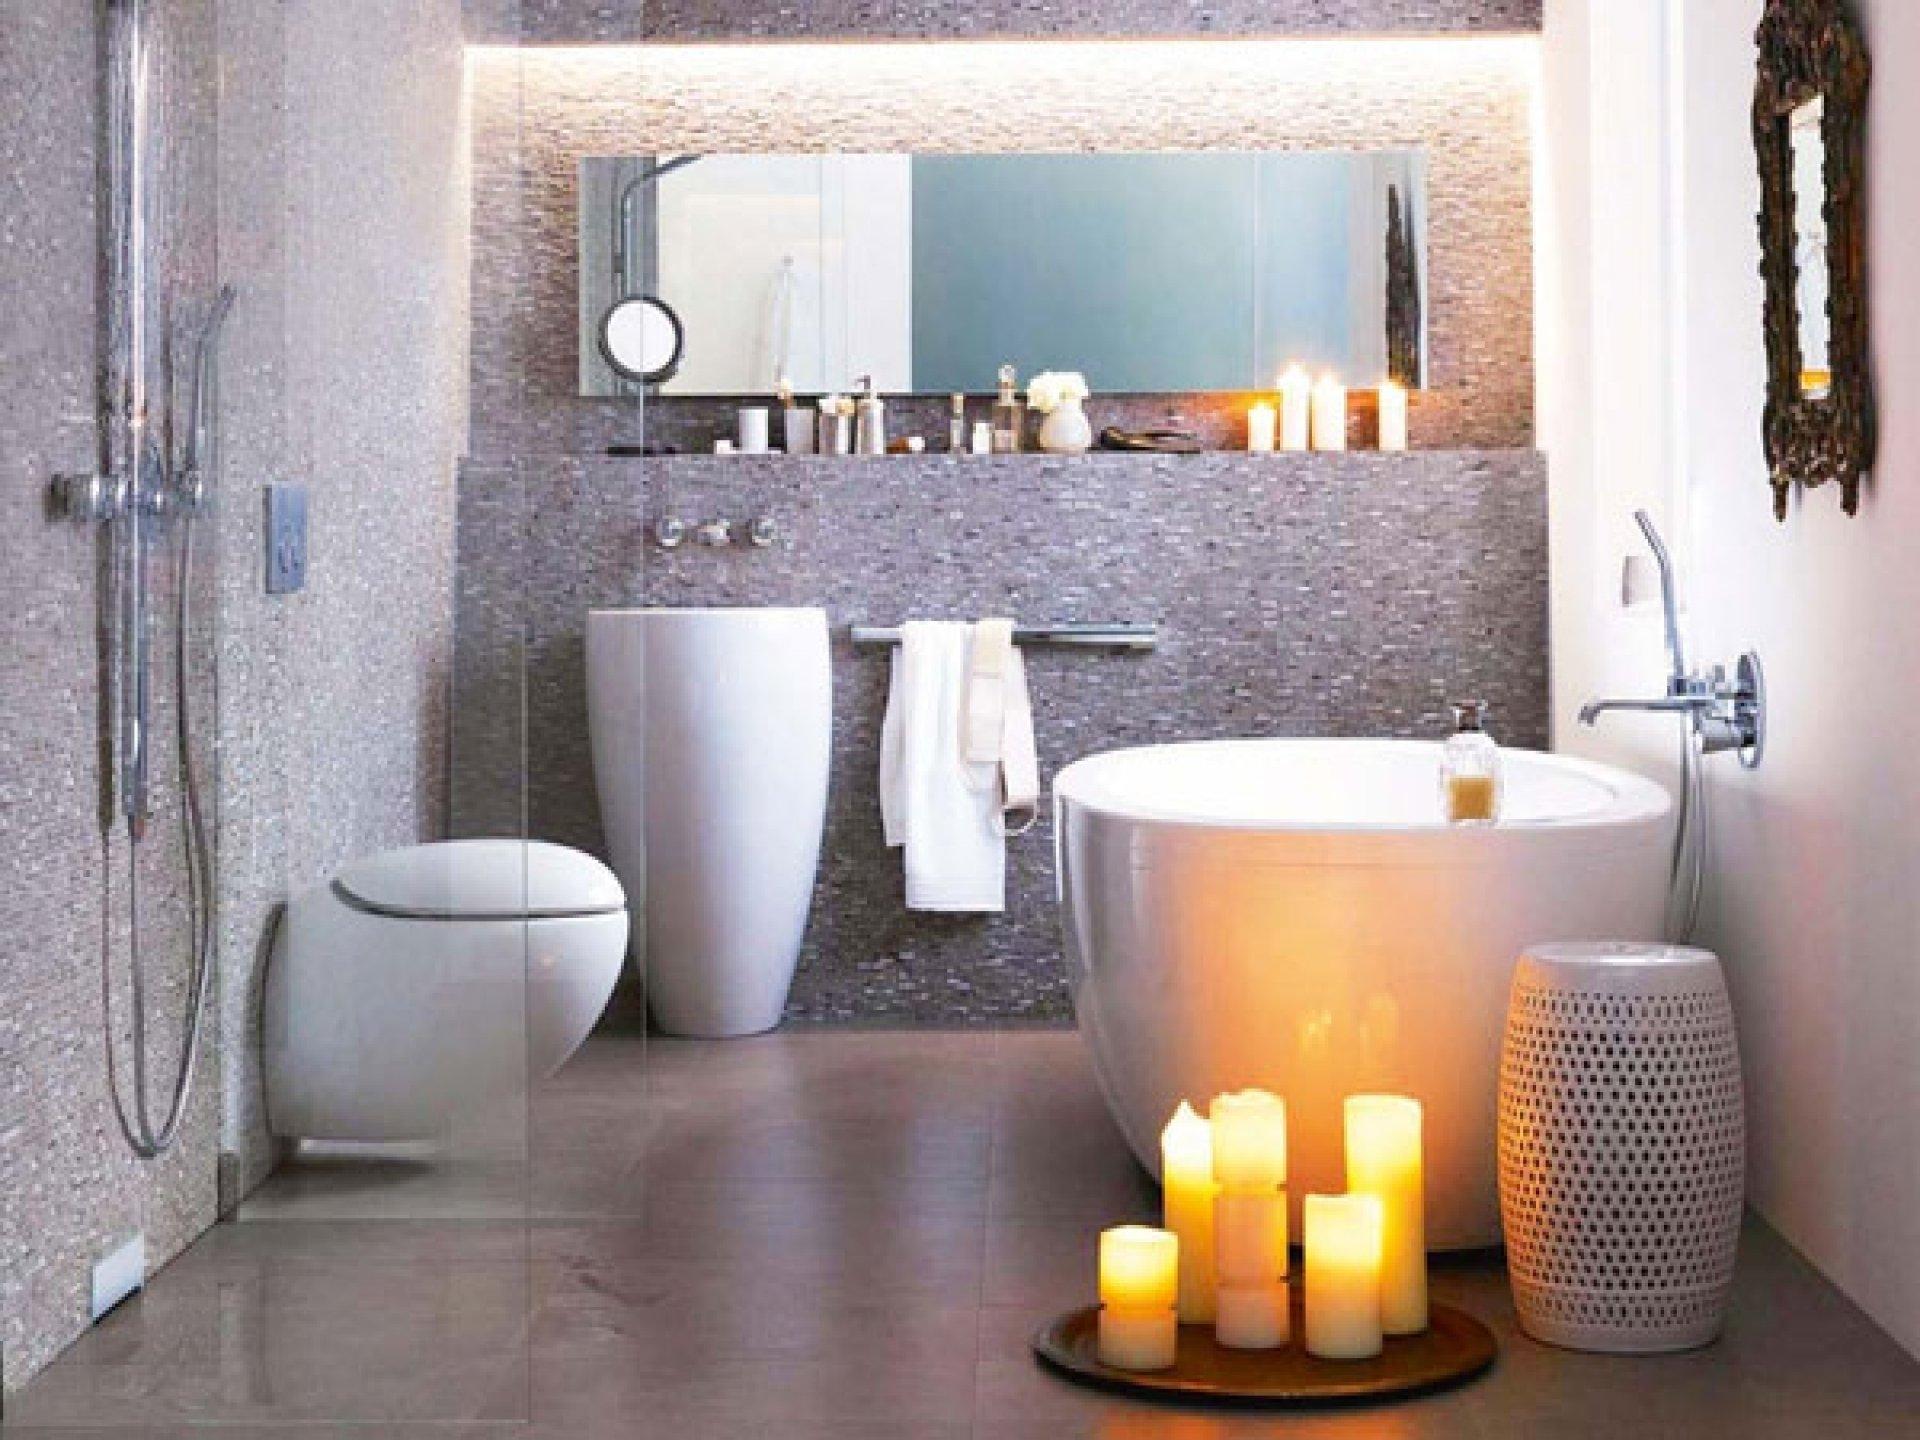 10 Famous Small Apartment Bathroom Decorating Ideas bathroom decorating ideas for small apartments loversiq